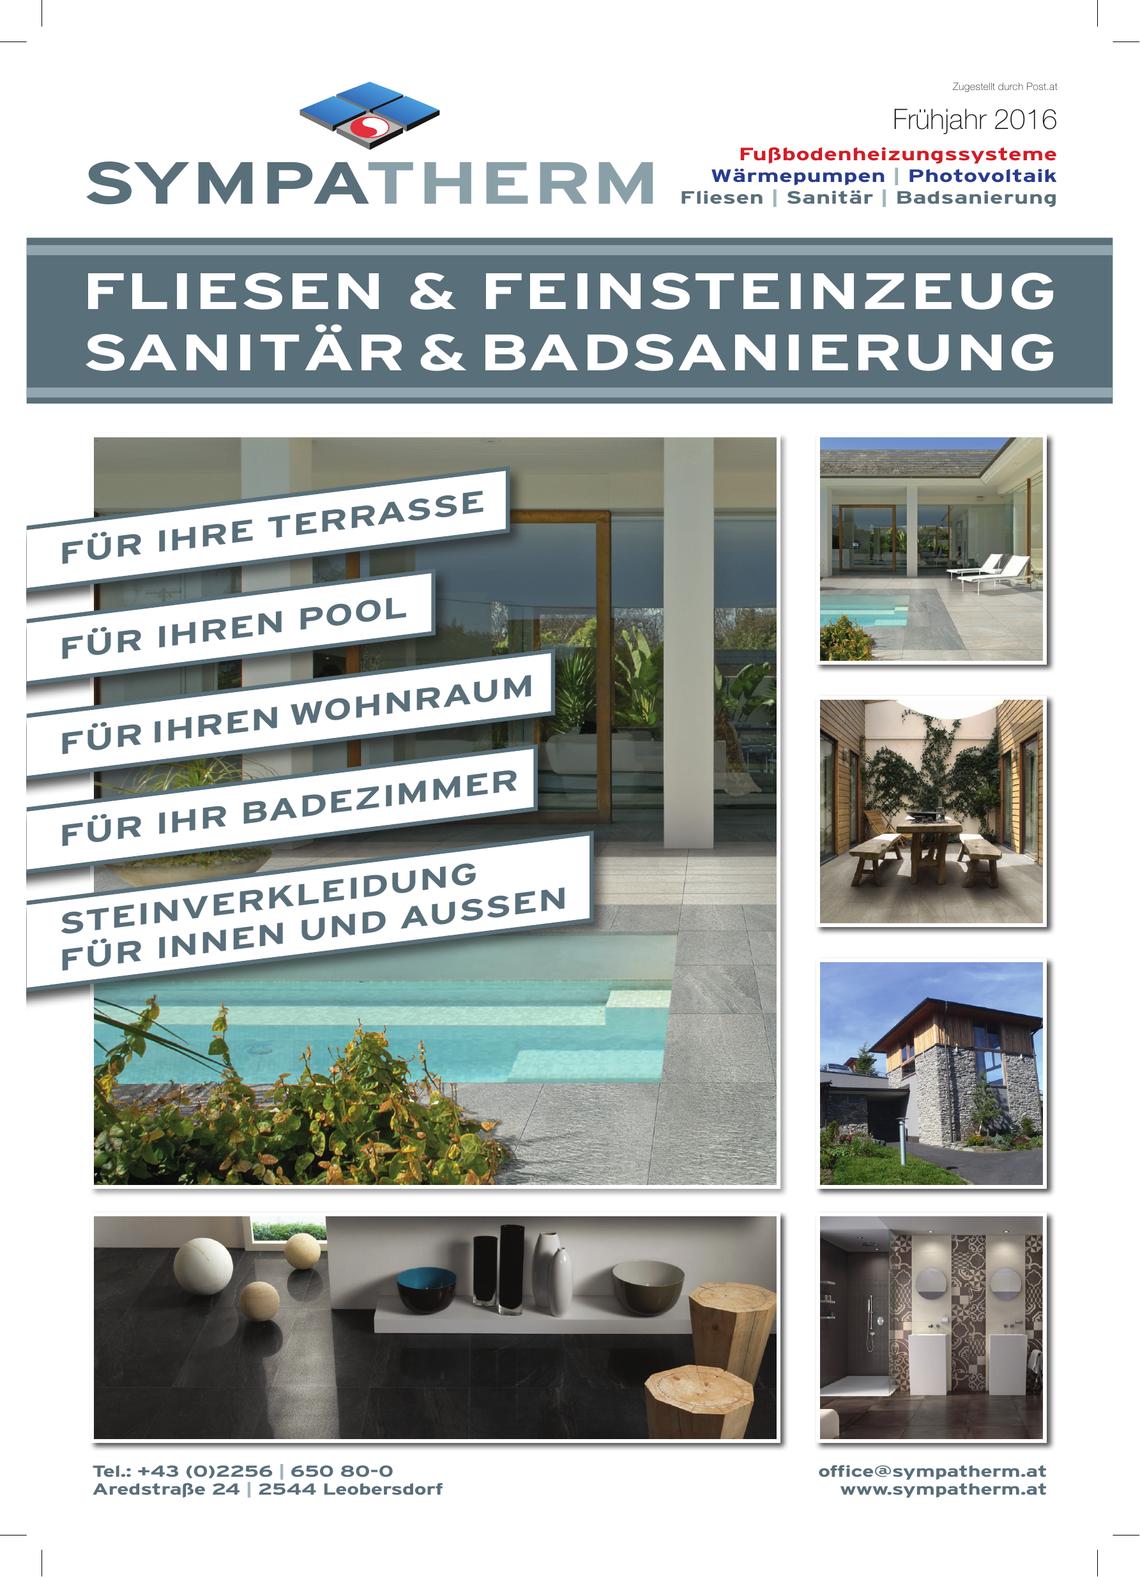 Sympatherm Flugblatt 01/2016